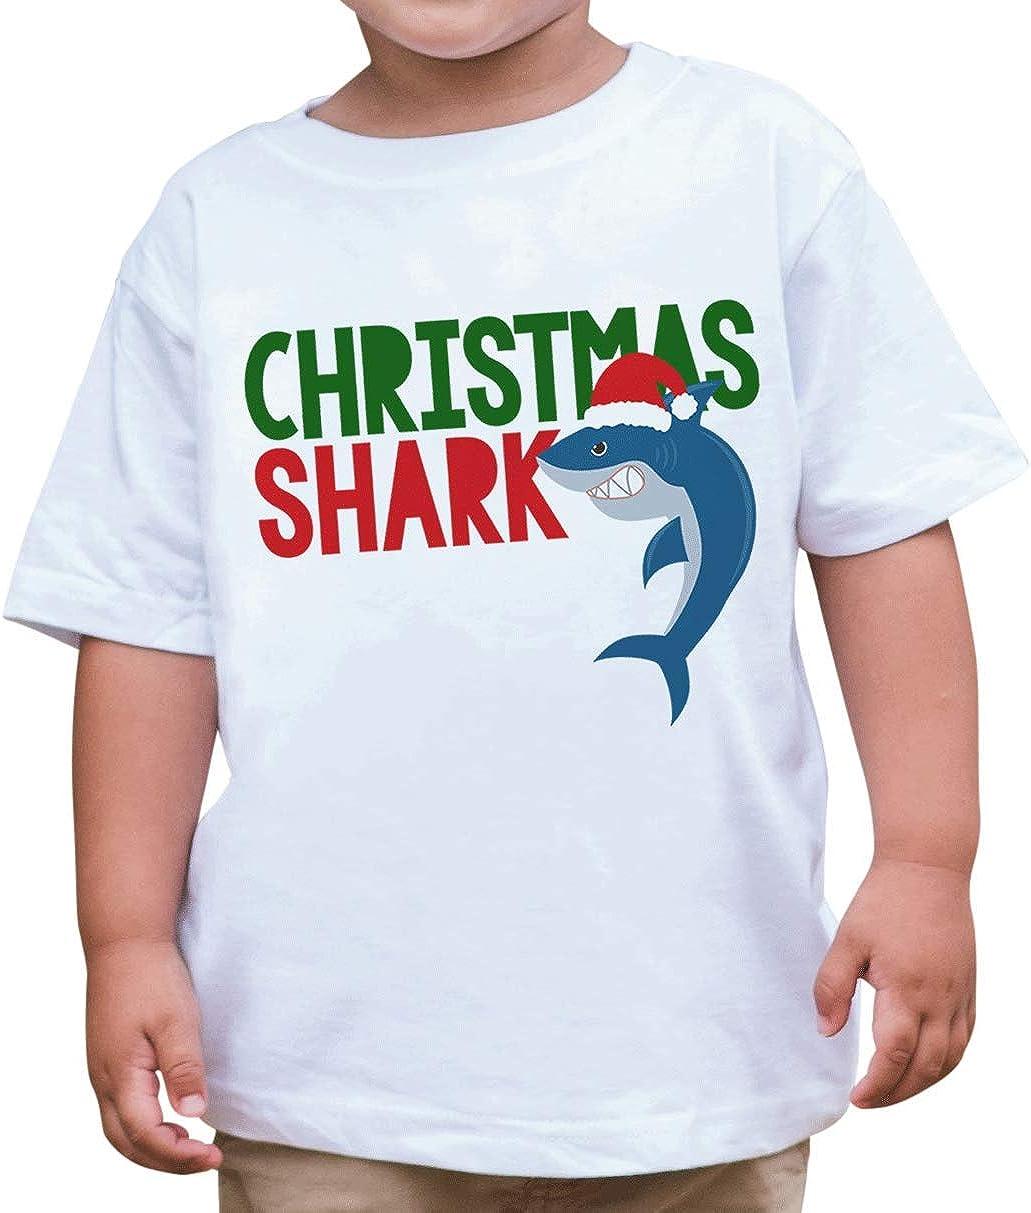 7 ate 9 Apparel Kids Shark Christmas T-Shirt